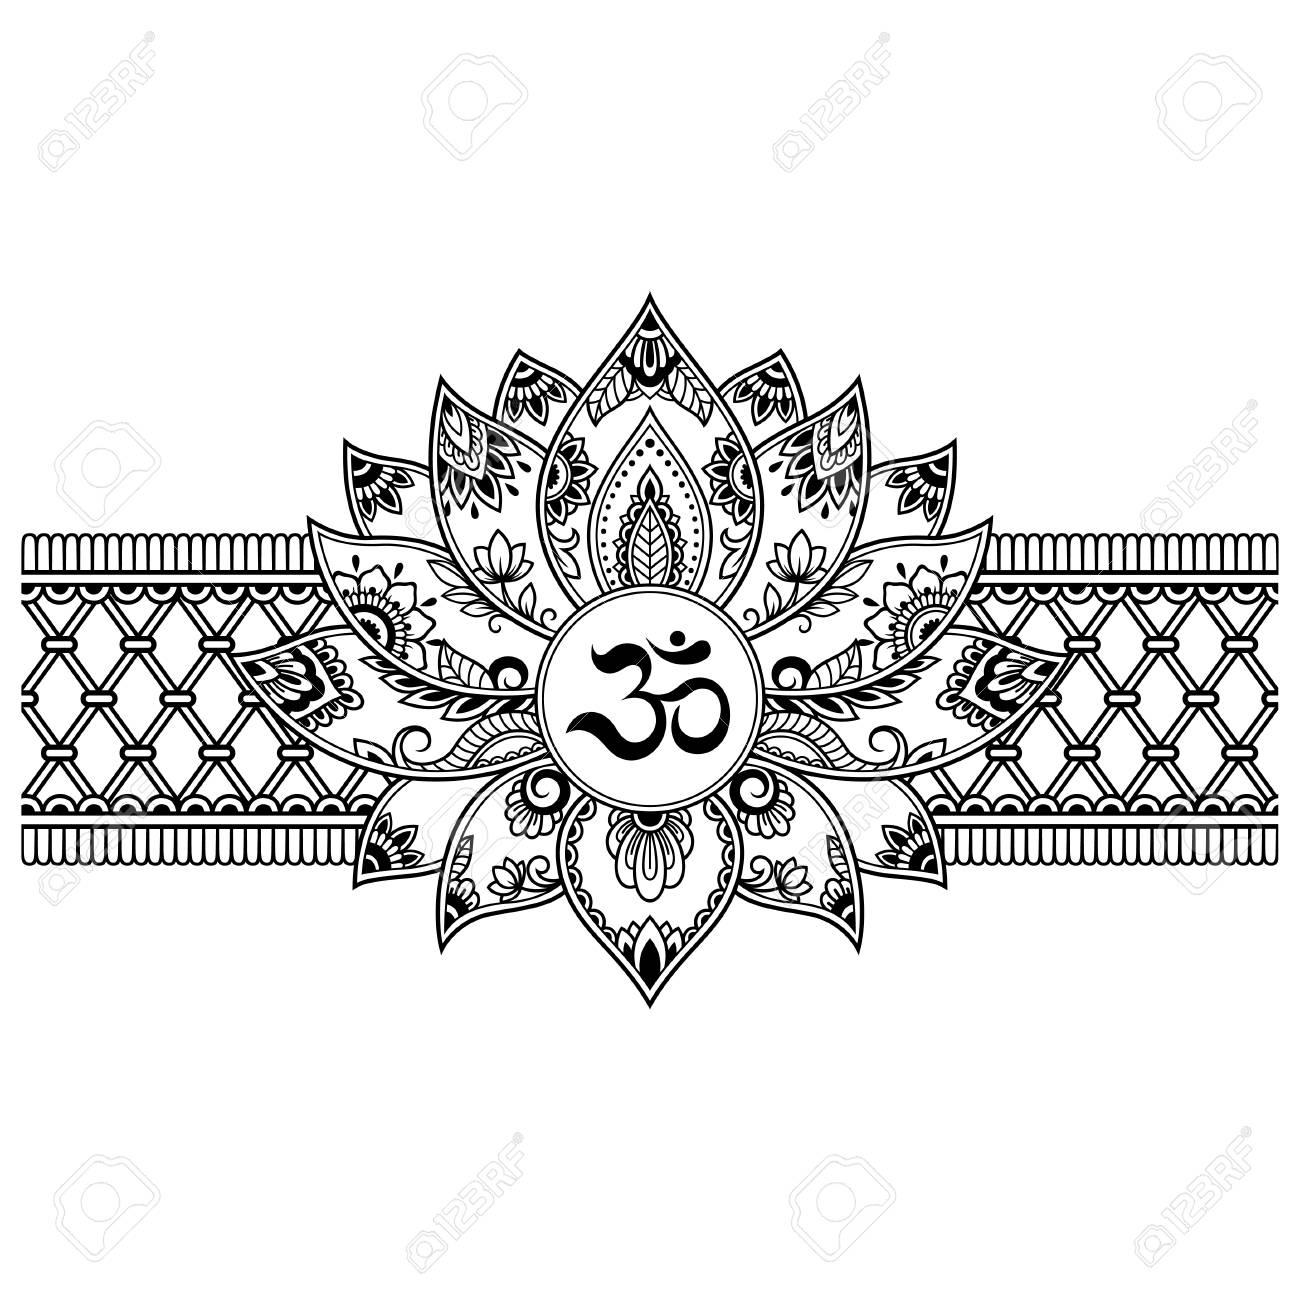 Mehndi Lotus Flower Pattern With Mantra Om Symbol And Border